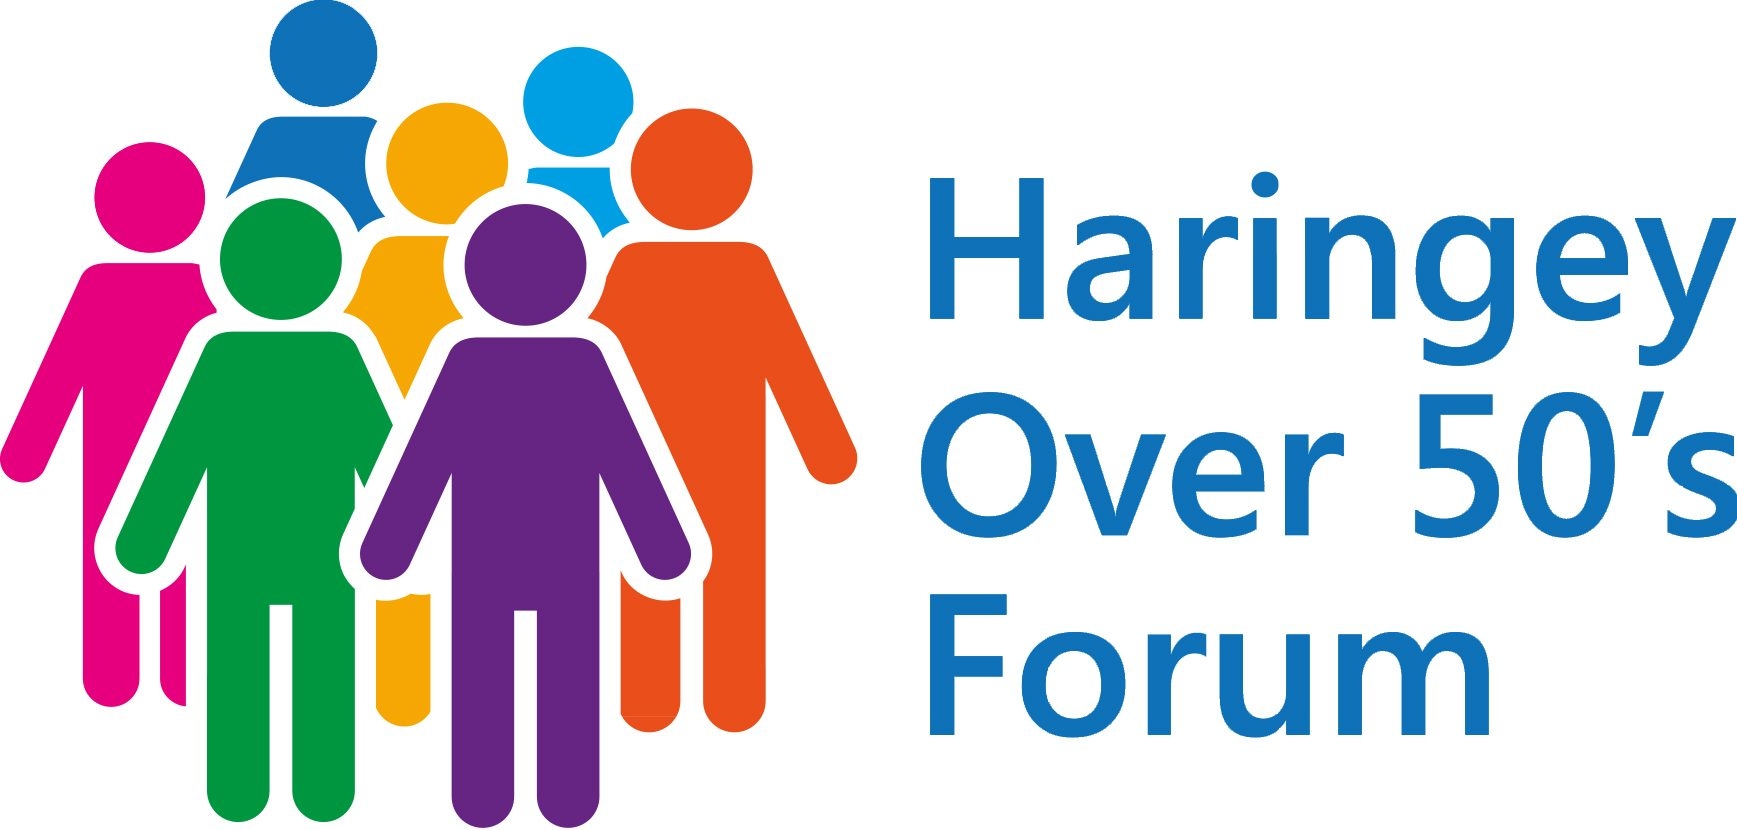 Haringey Over 50s Forum